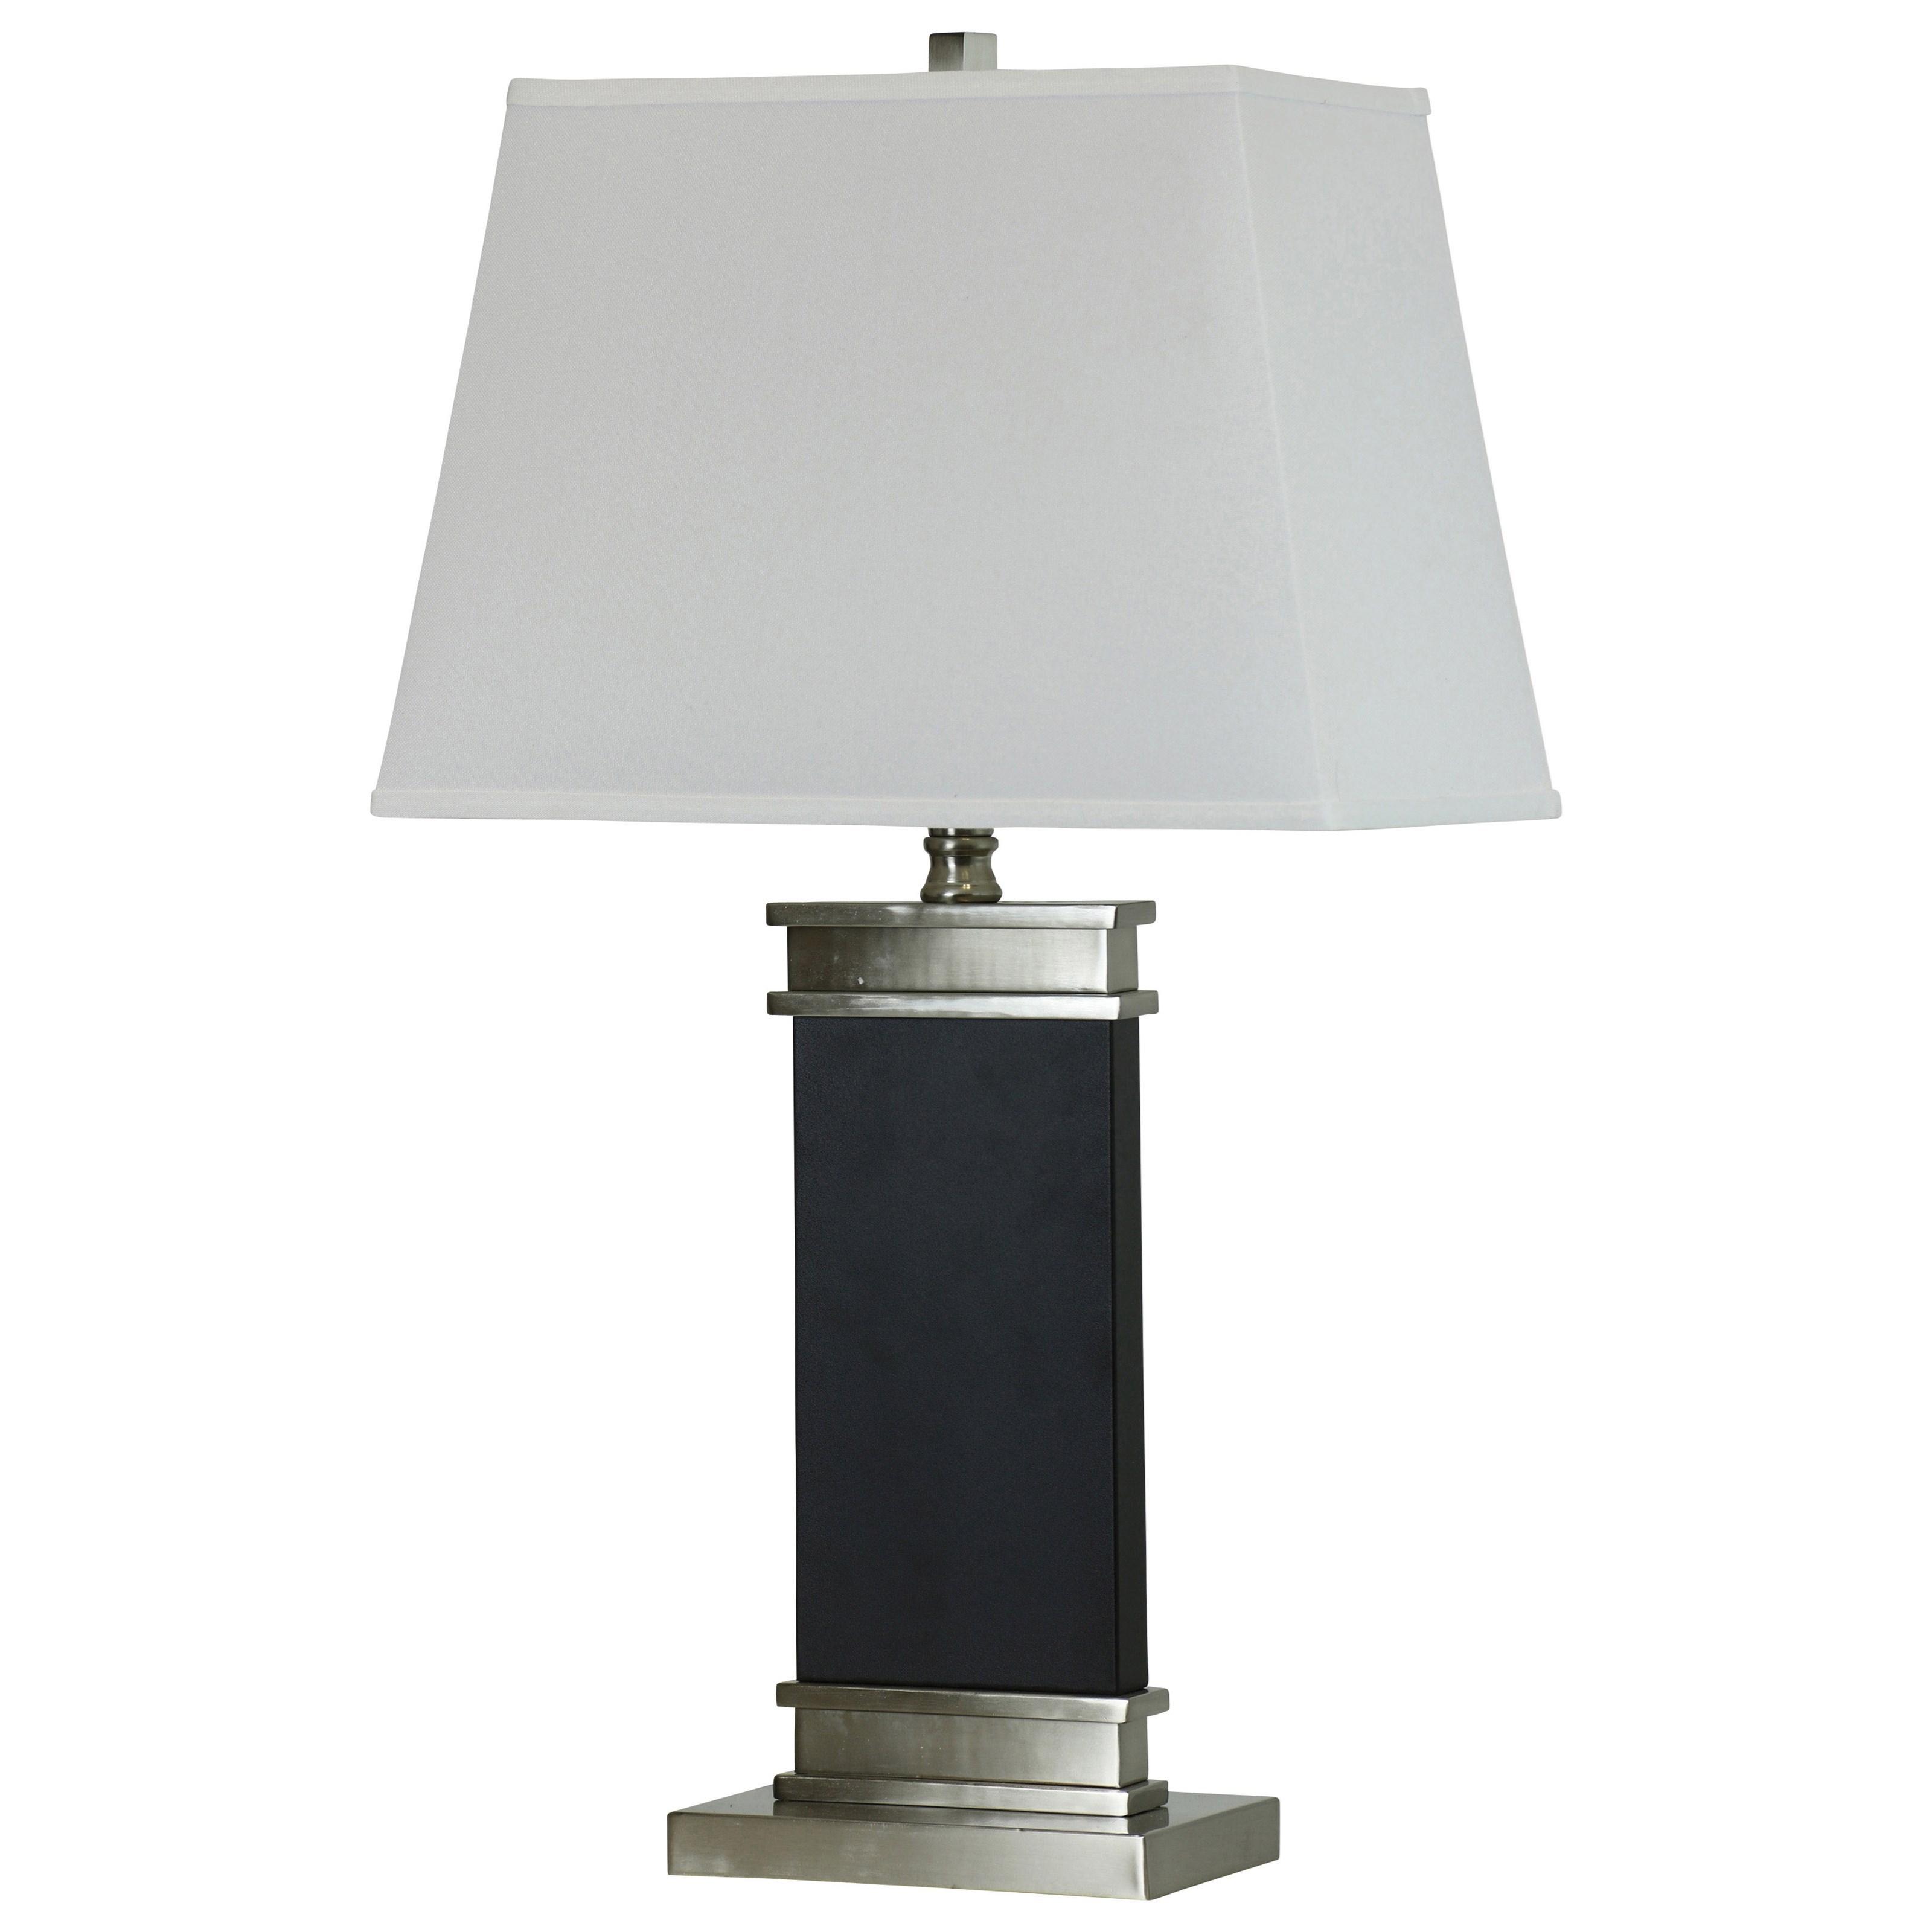 StyleCraft Lamps Black Steel Table Lamp